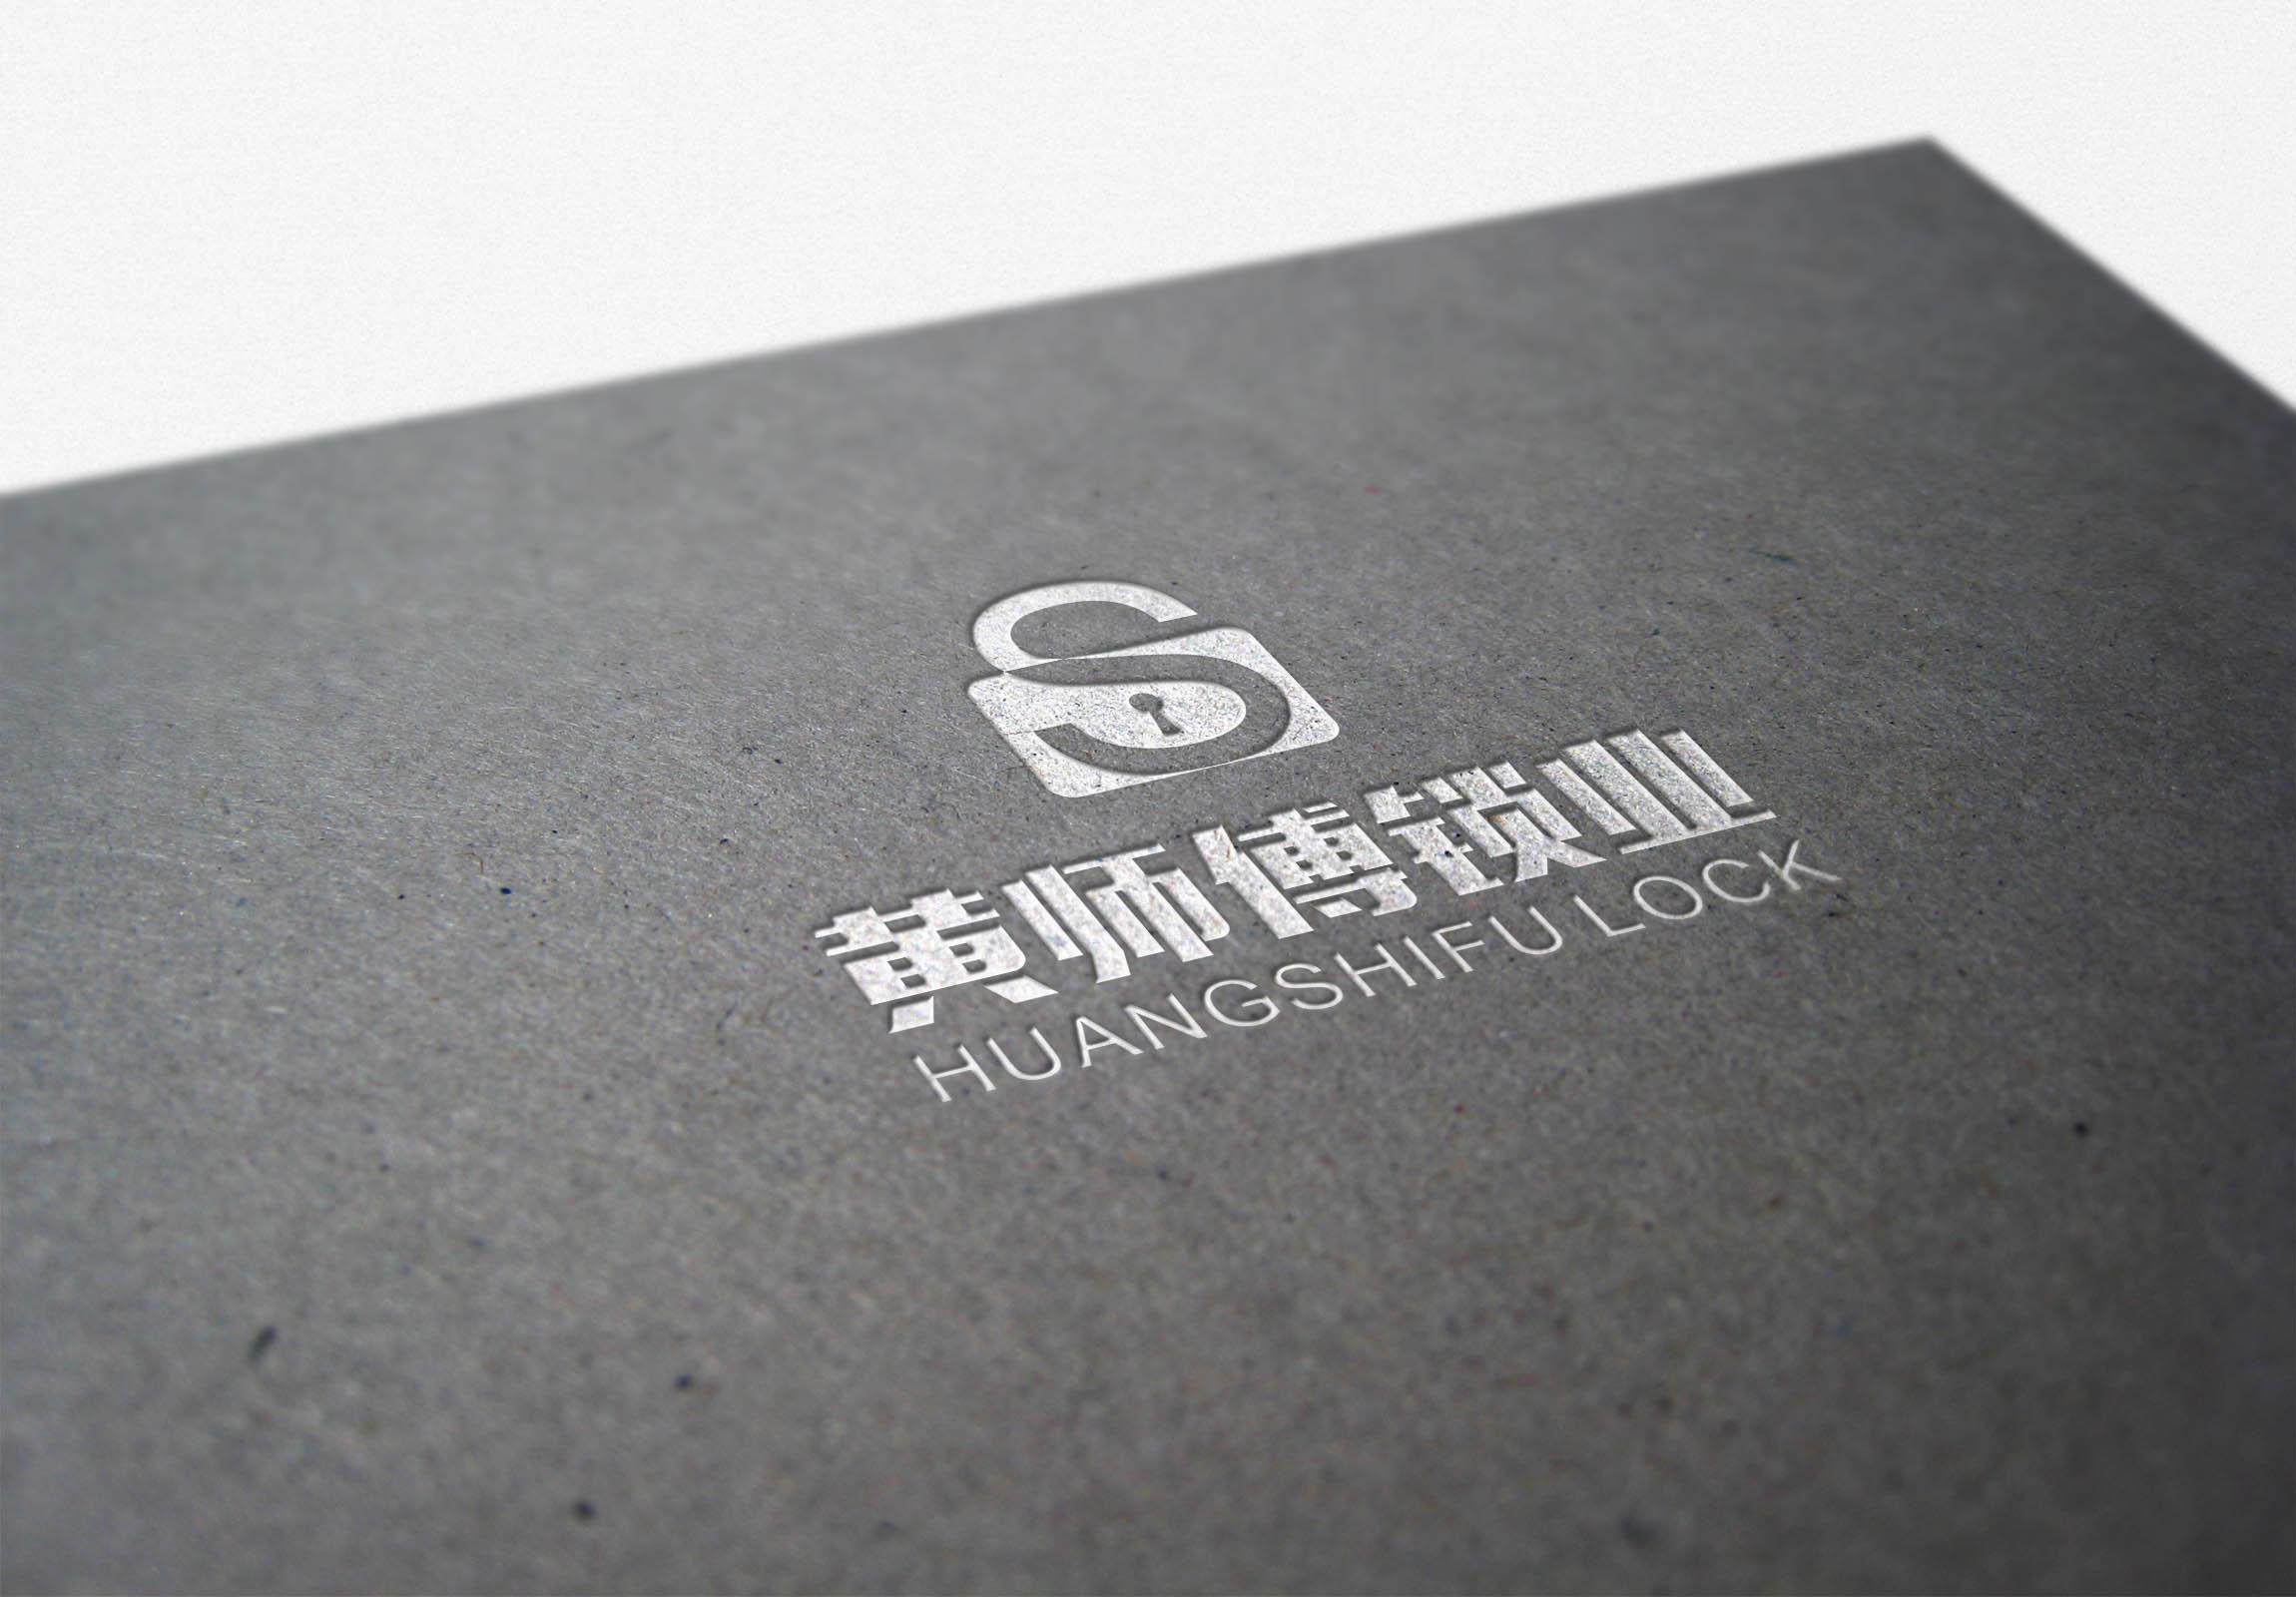 �S��傅�_�i�W站logo�O� (5天完成)_3024202_k68威客�W